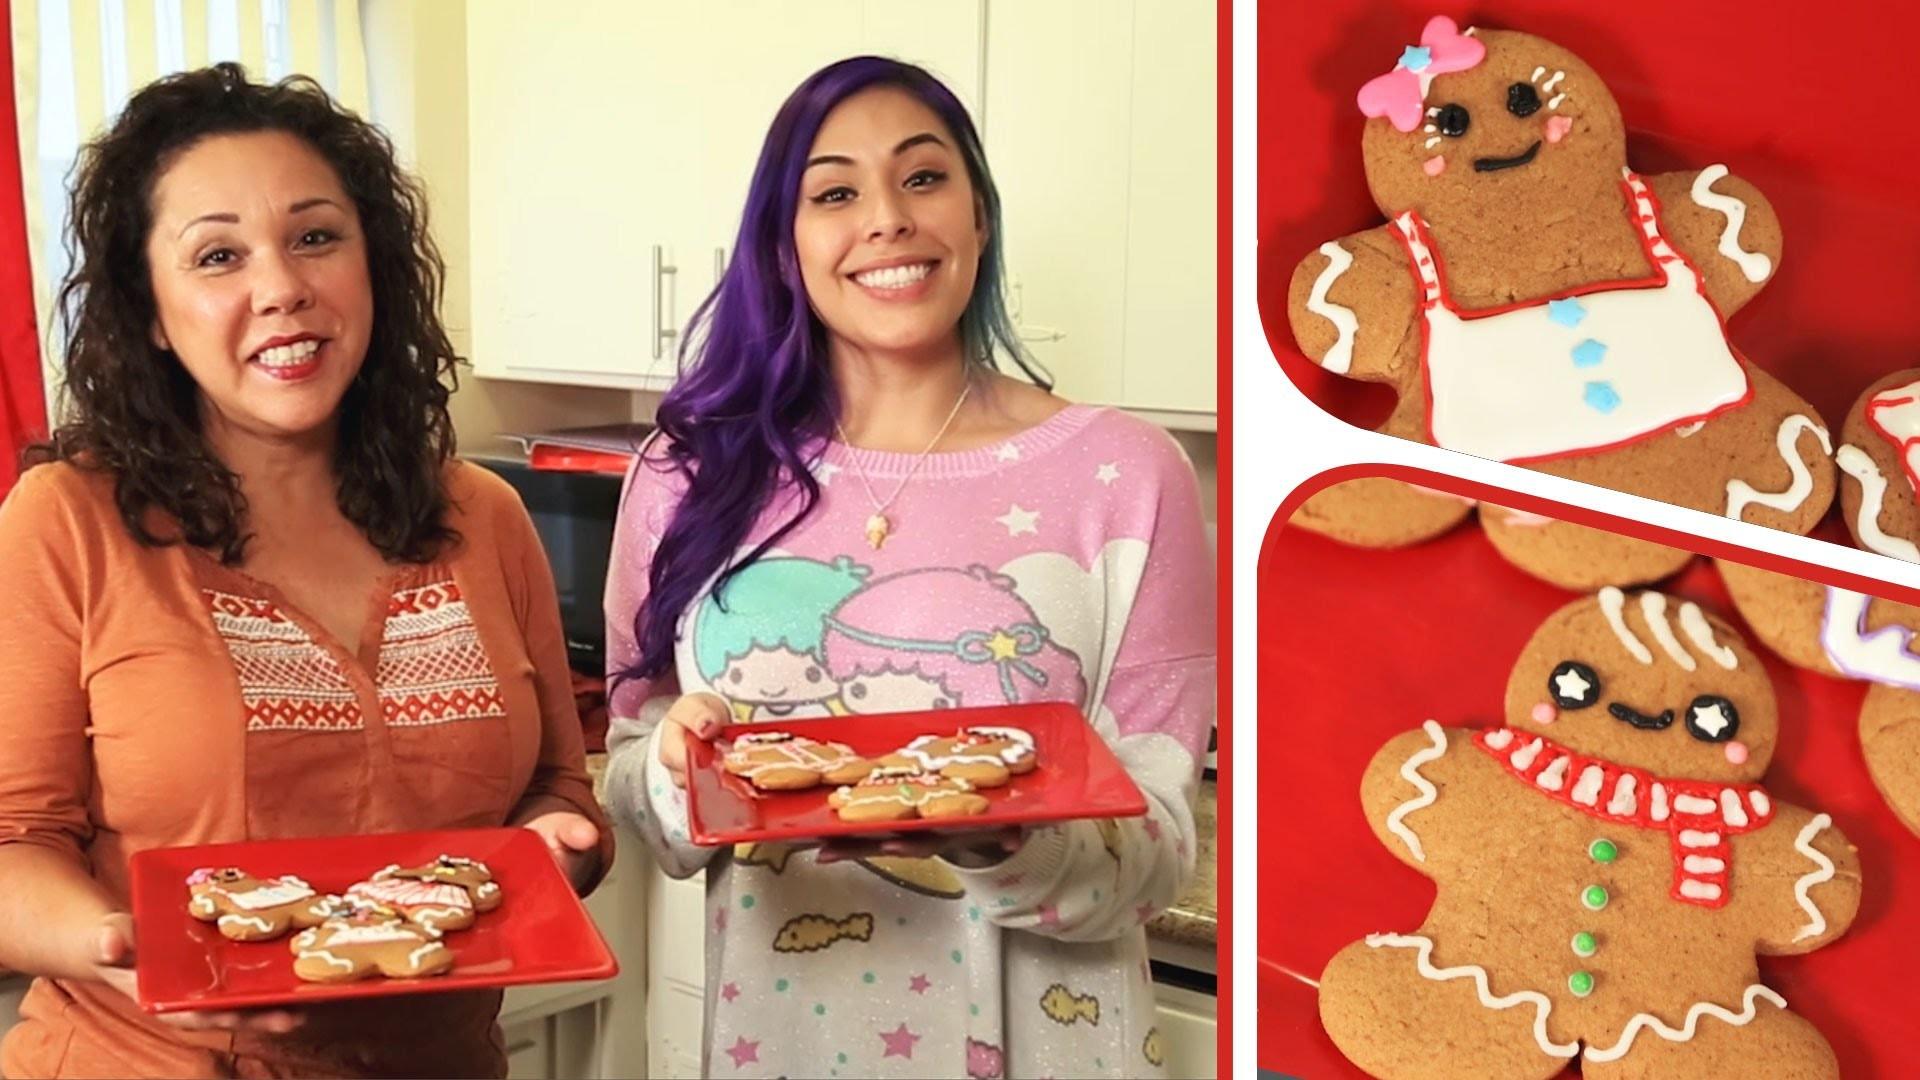 Gingerbread Men with my Mom - KAWAIIMAS